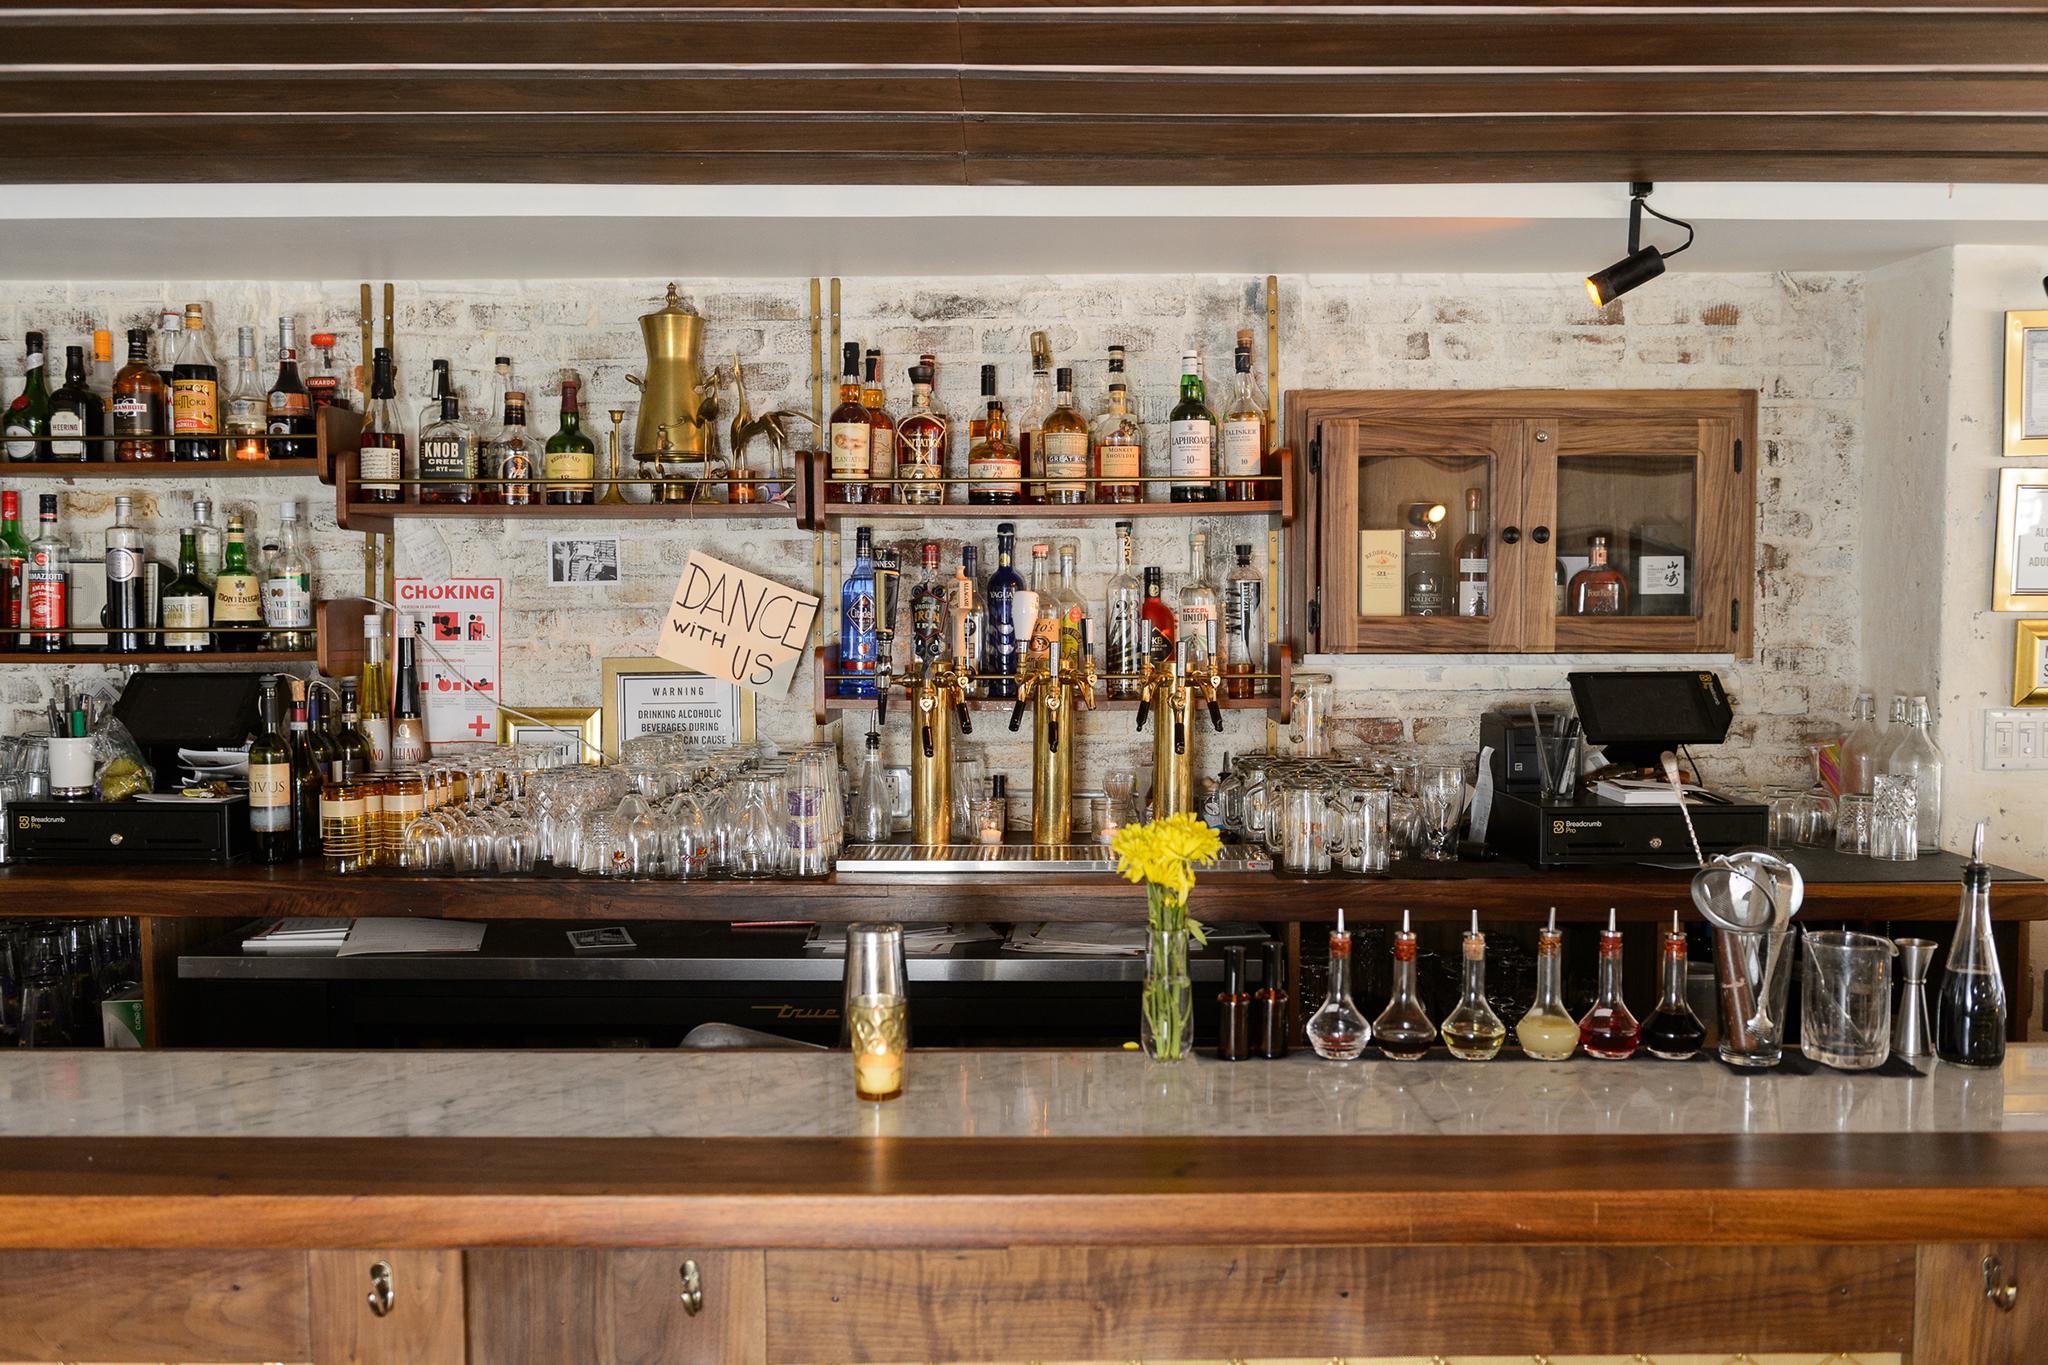 Williamsburg brooklyn guide to bars restaurants and for Things to do in williamsburg brooklyn